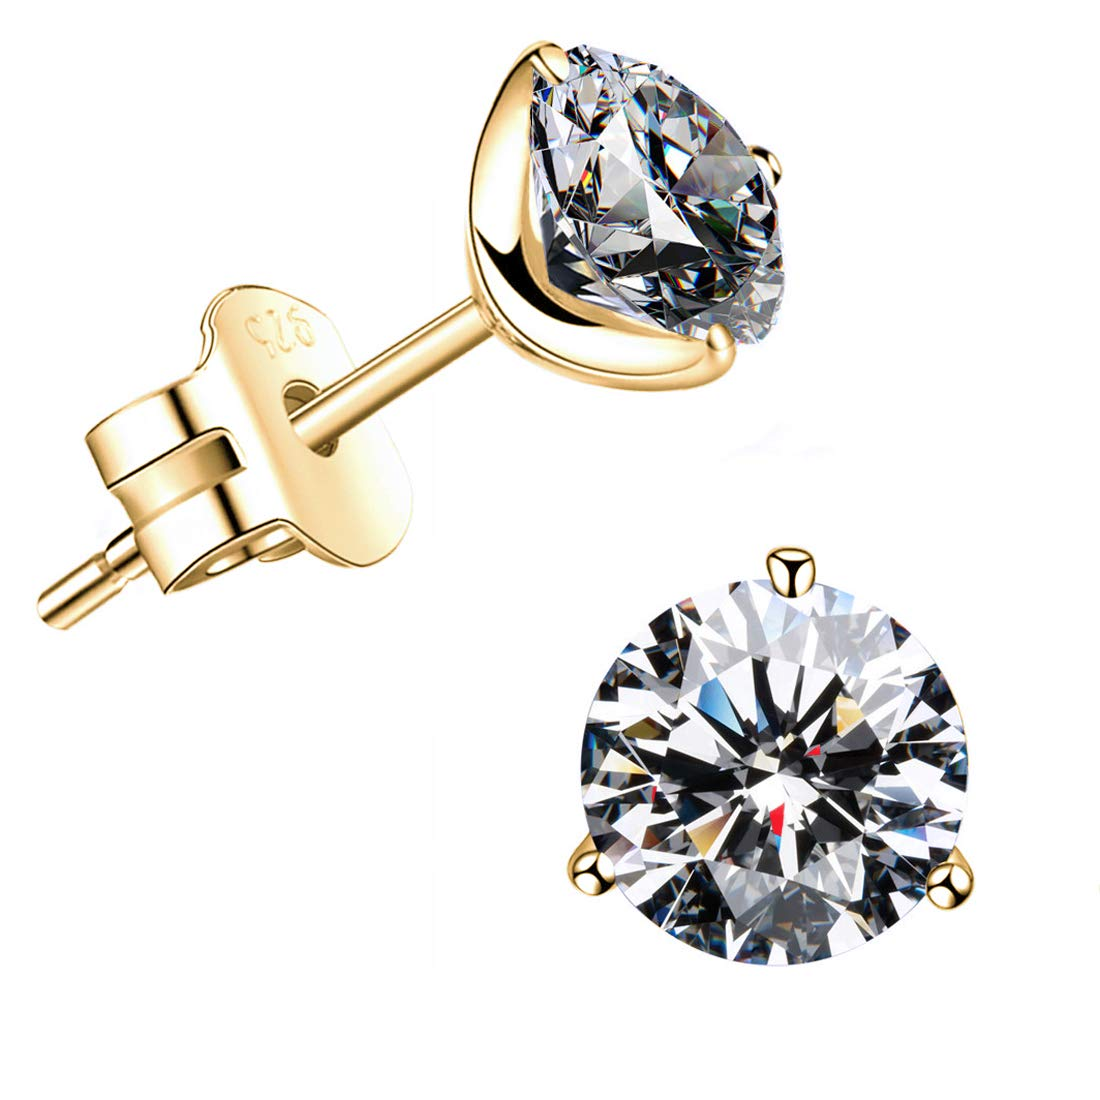 e13d40044b8e6 Black Silver Dangle Stud Earrings My Posh Picks t